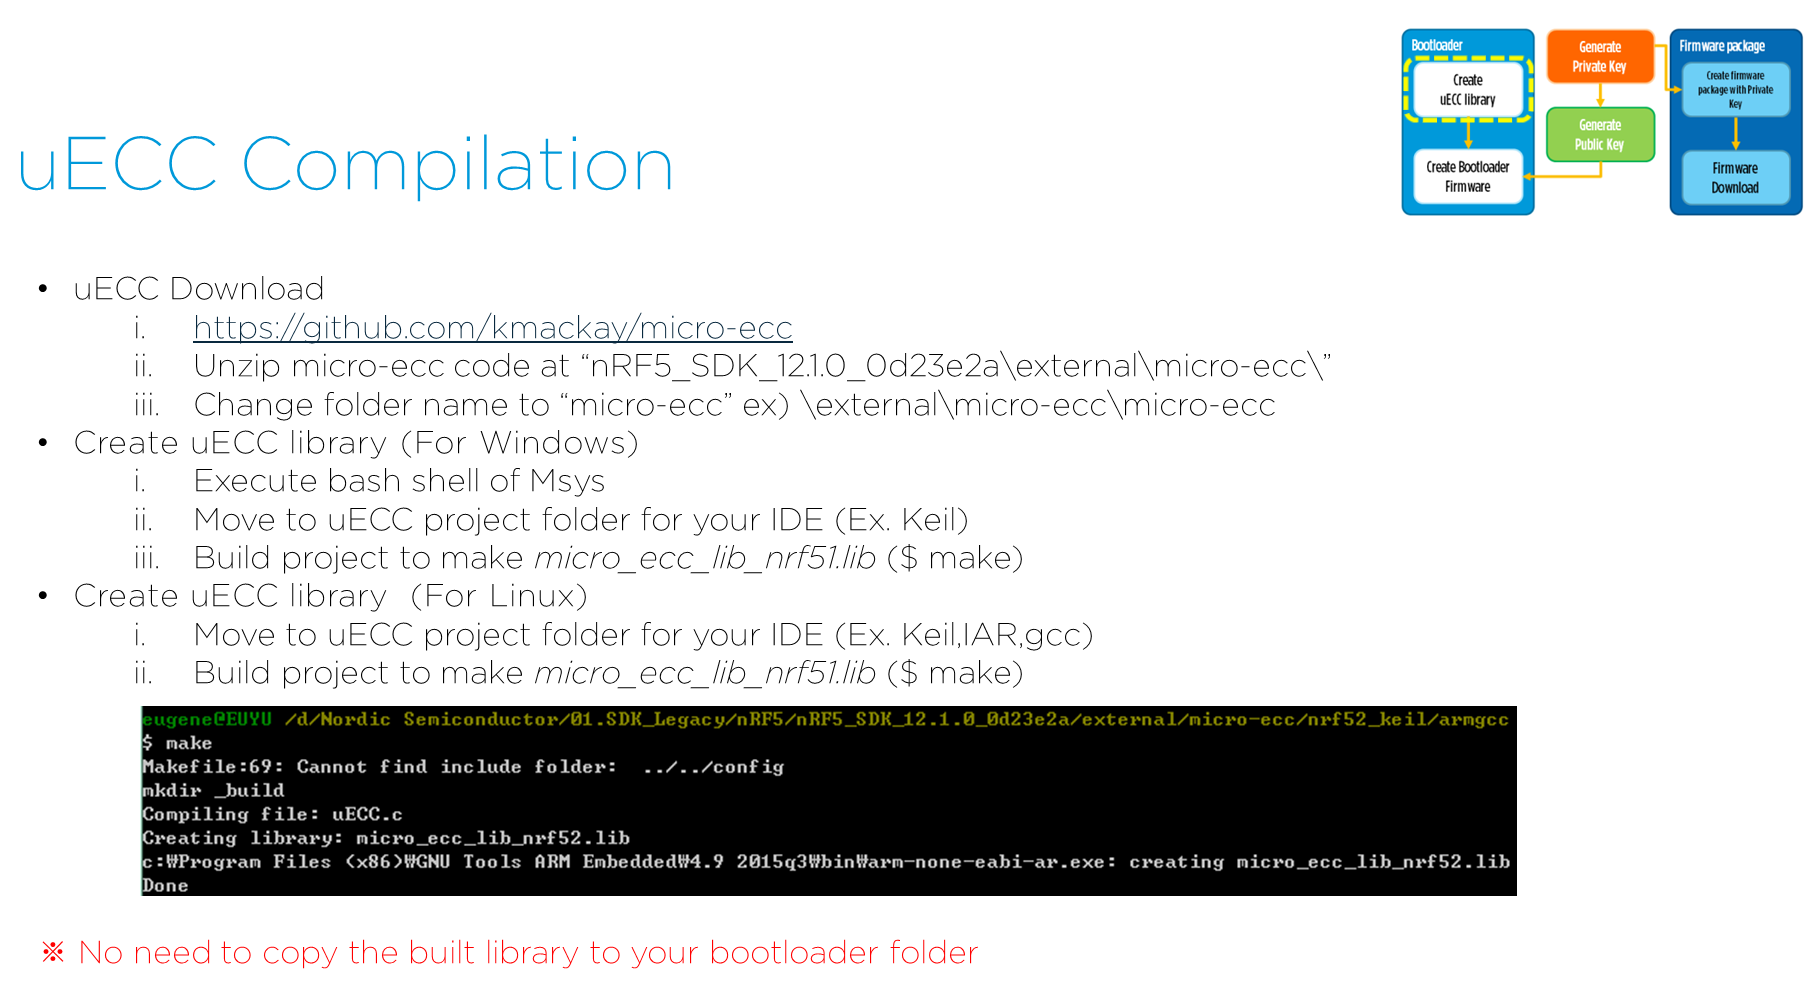 Installing micro-ecc issue - Nordic DevZone